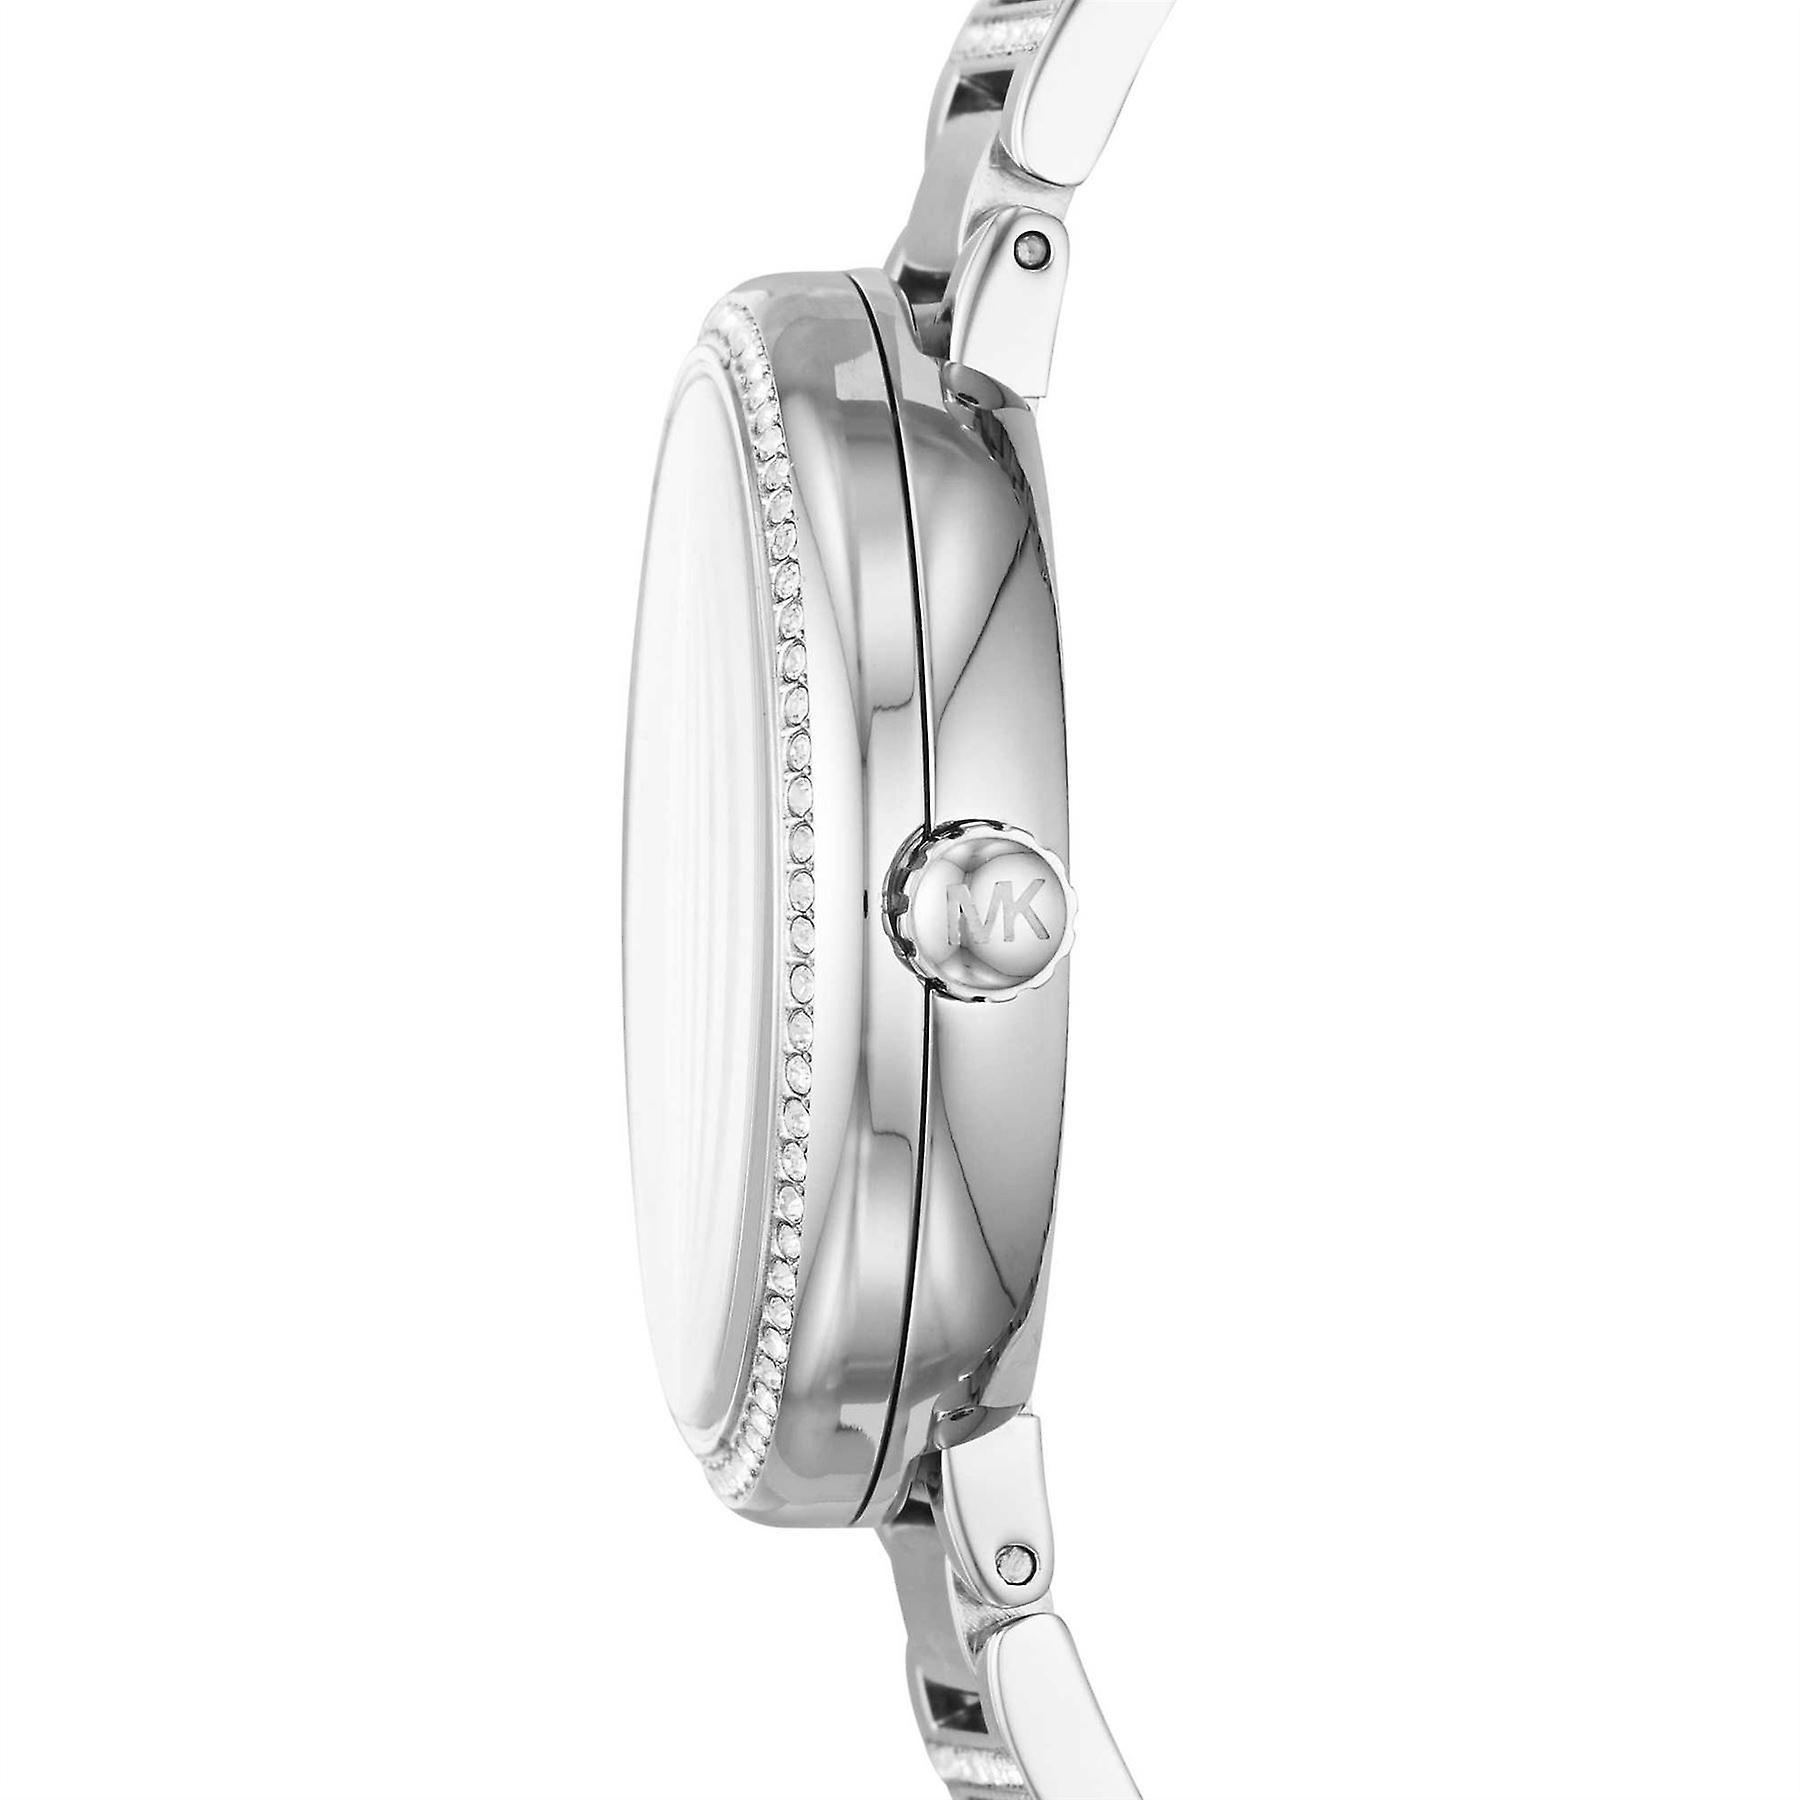 Michael Kors Courtney Pave Crystal Silver Tone Mesdames Wrist Watch MK3835